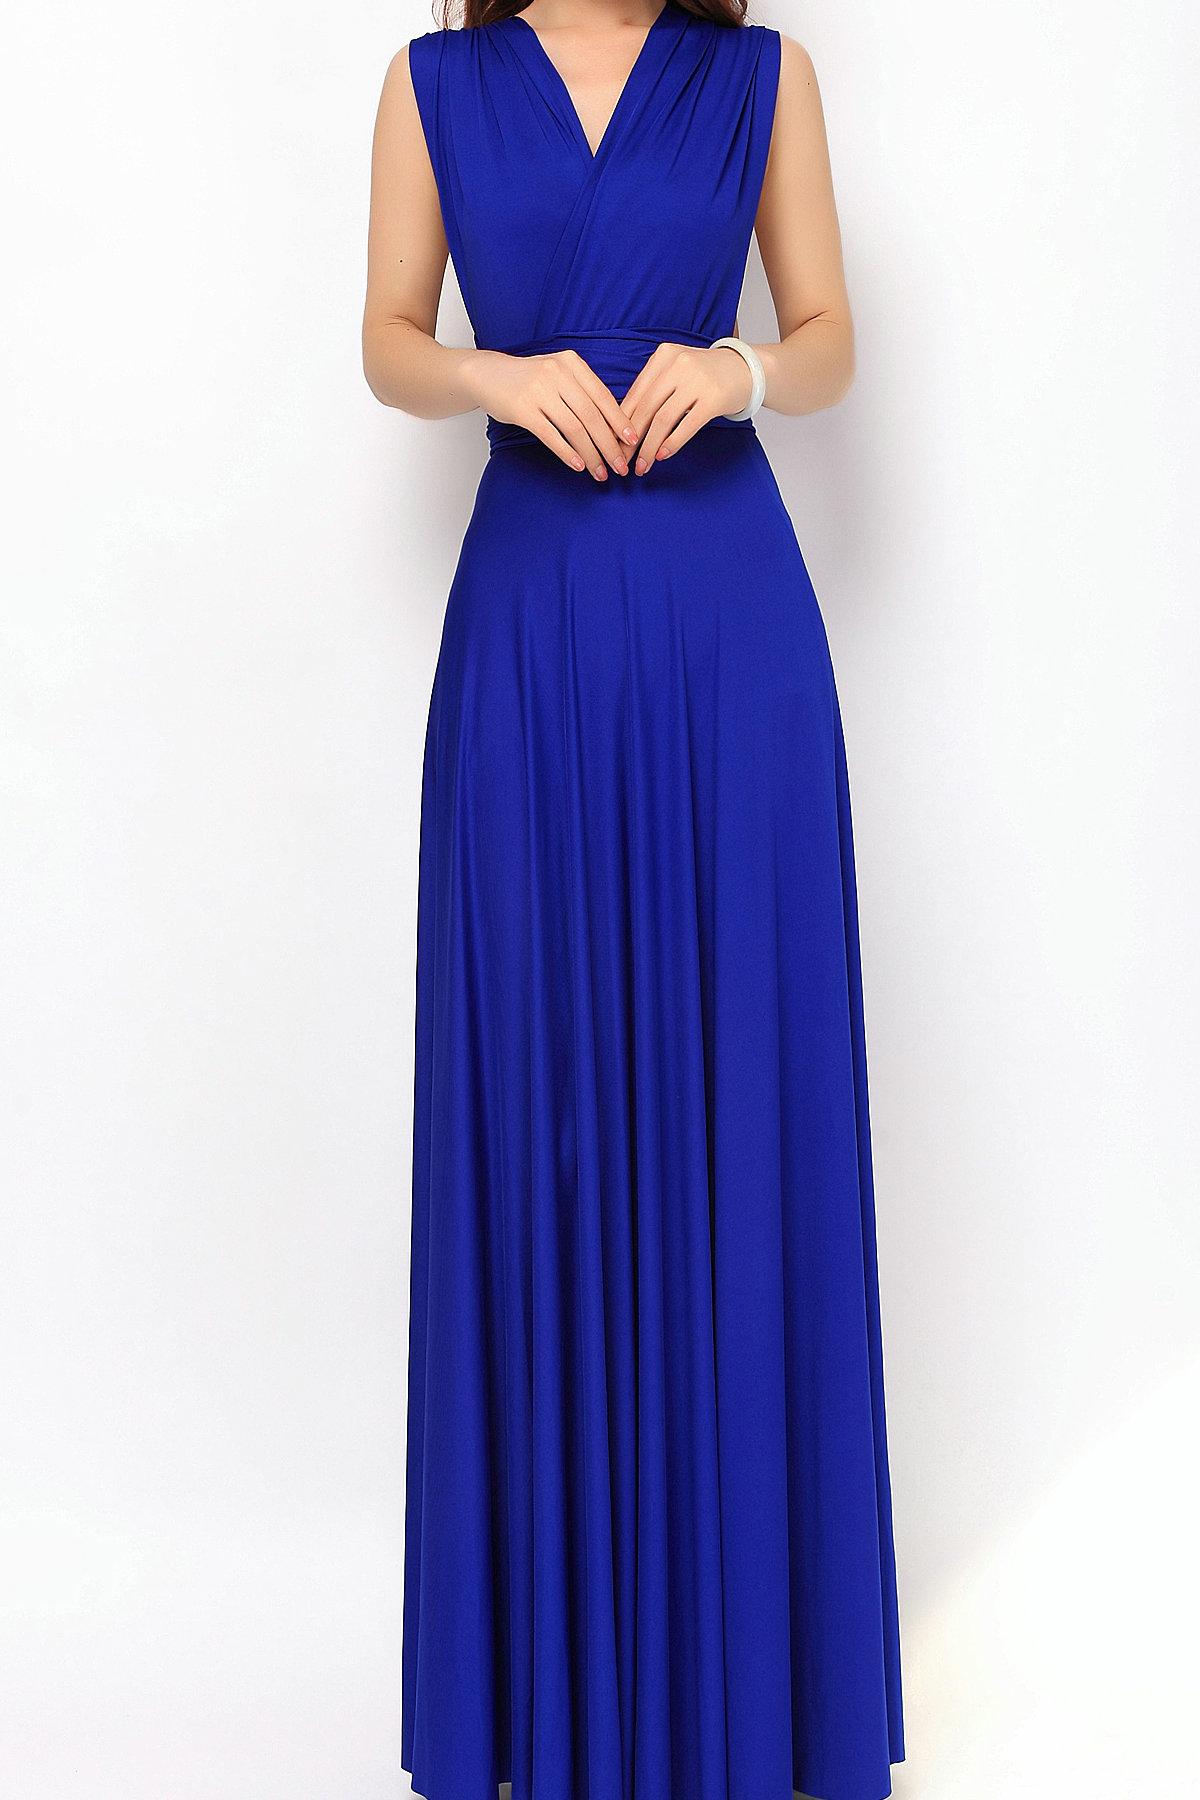 Convertible Maxi Dress | DressedUpGirl.com